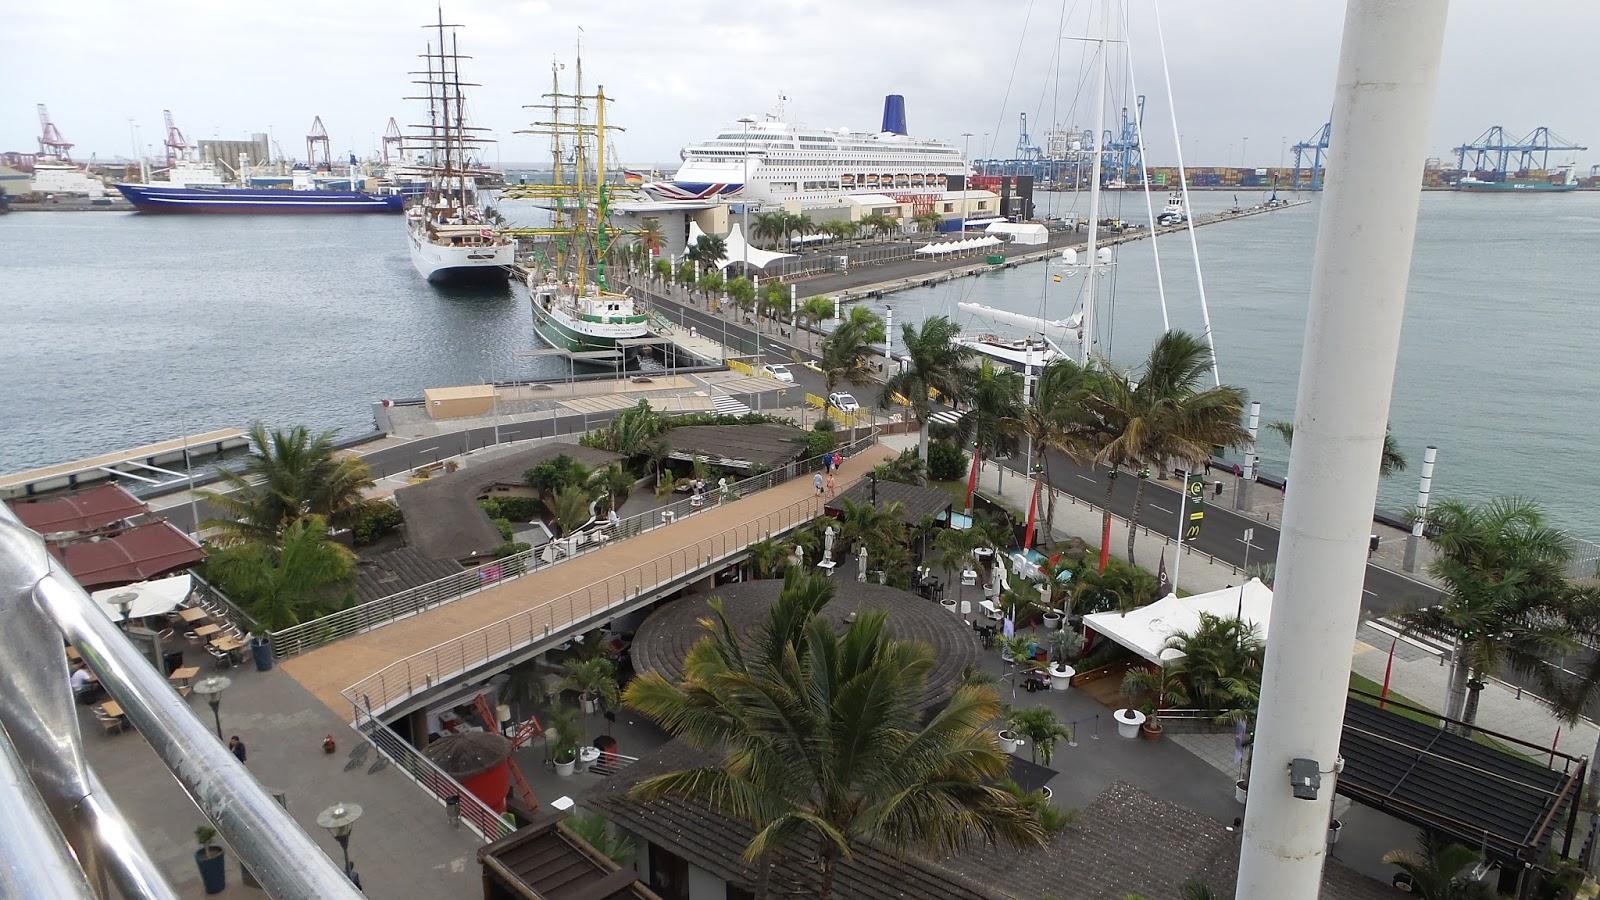 Gran canaria reise info einkaufszentrum c c el muelle in for Oficina fred olsen santa catalina